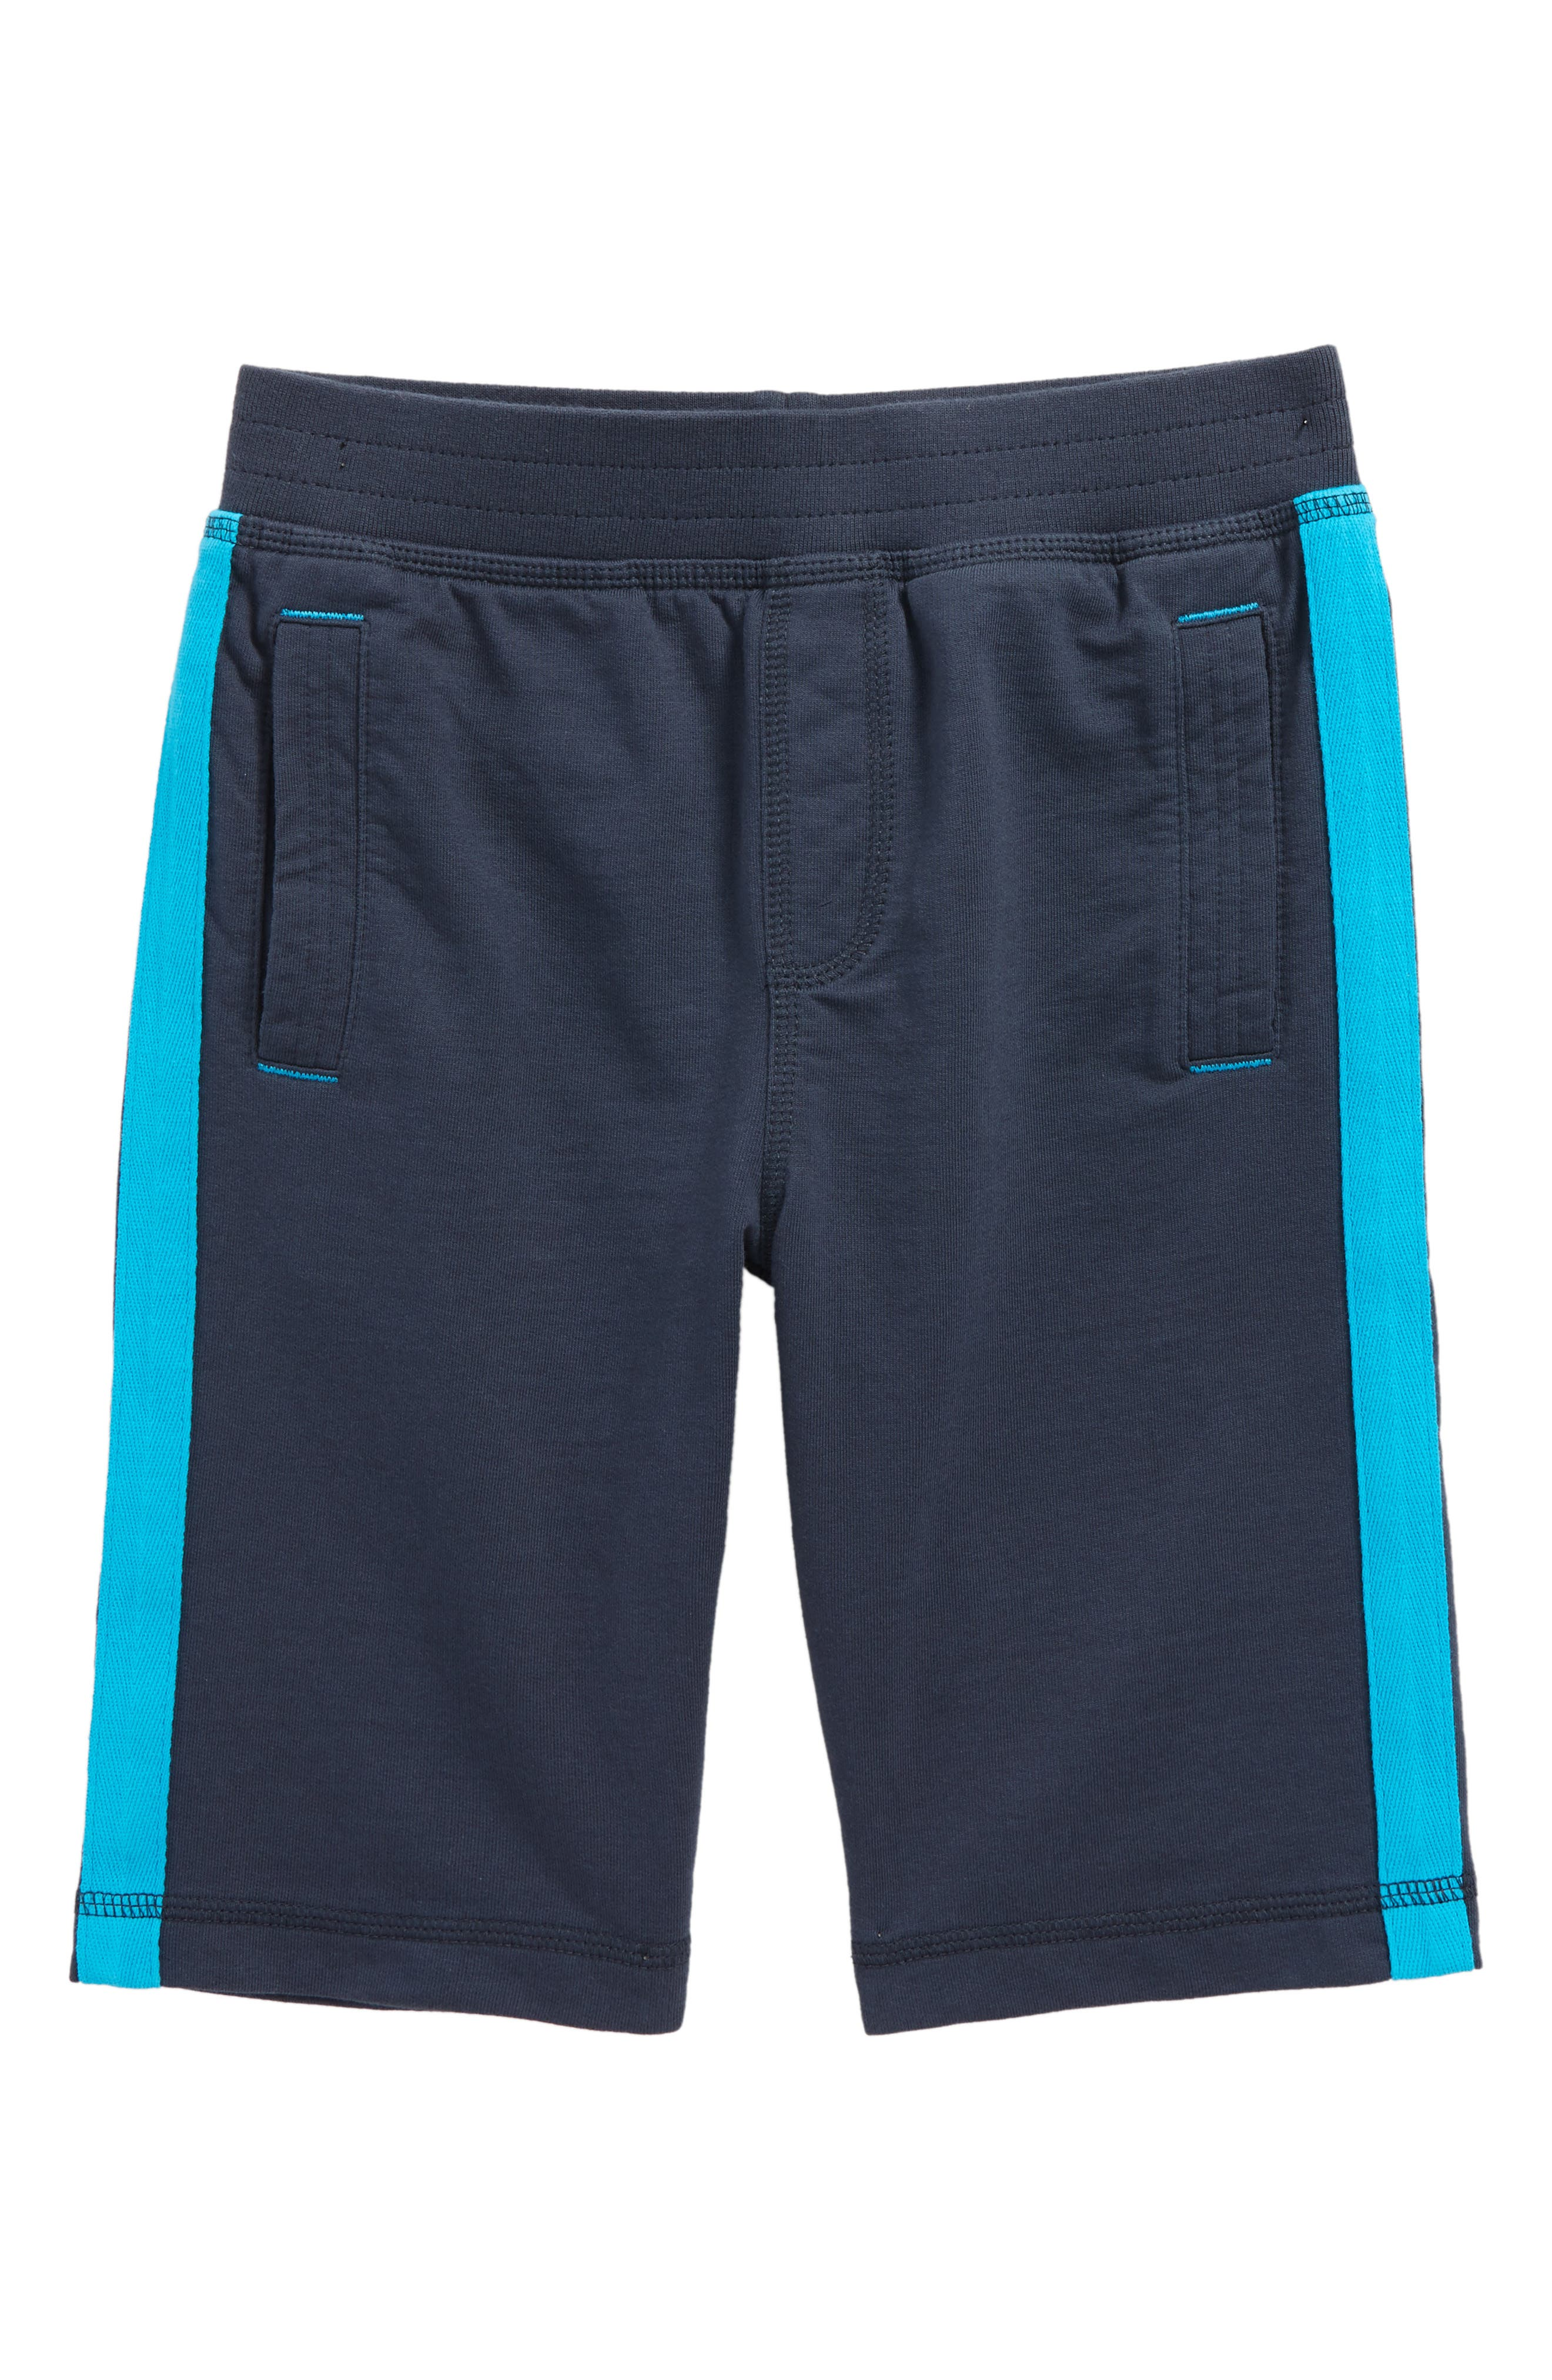 Tea Collection Side Stripe Shorts (Toddler Boys & Little Boys)